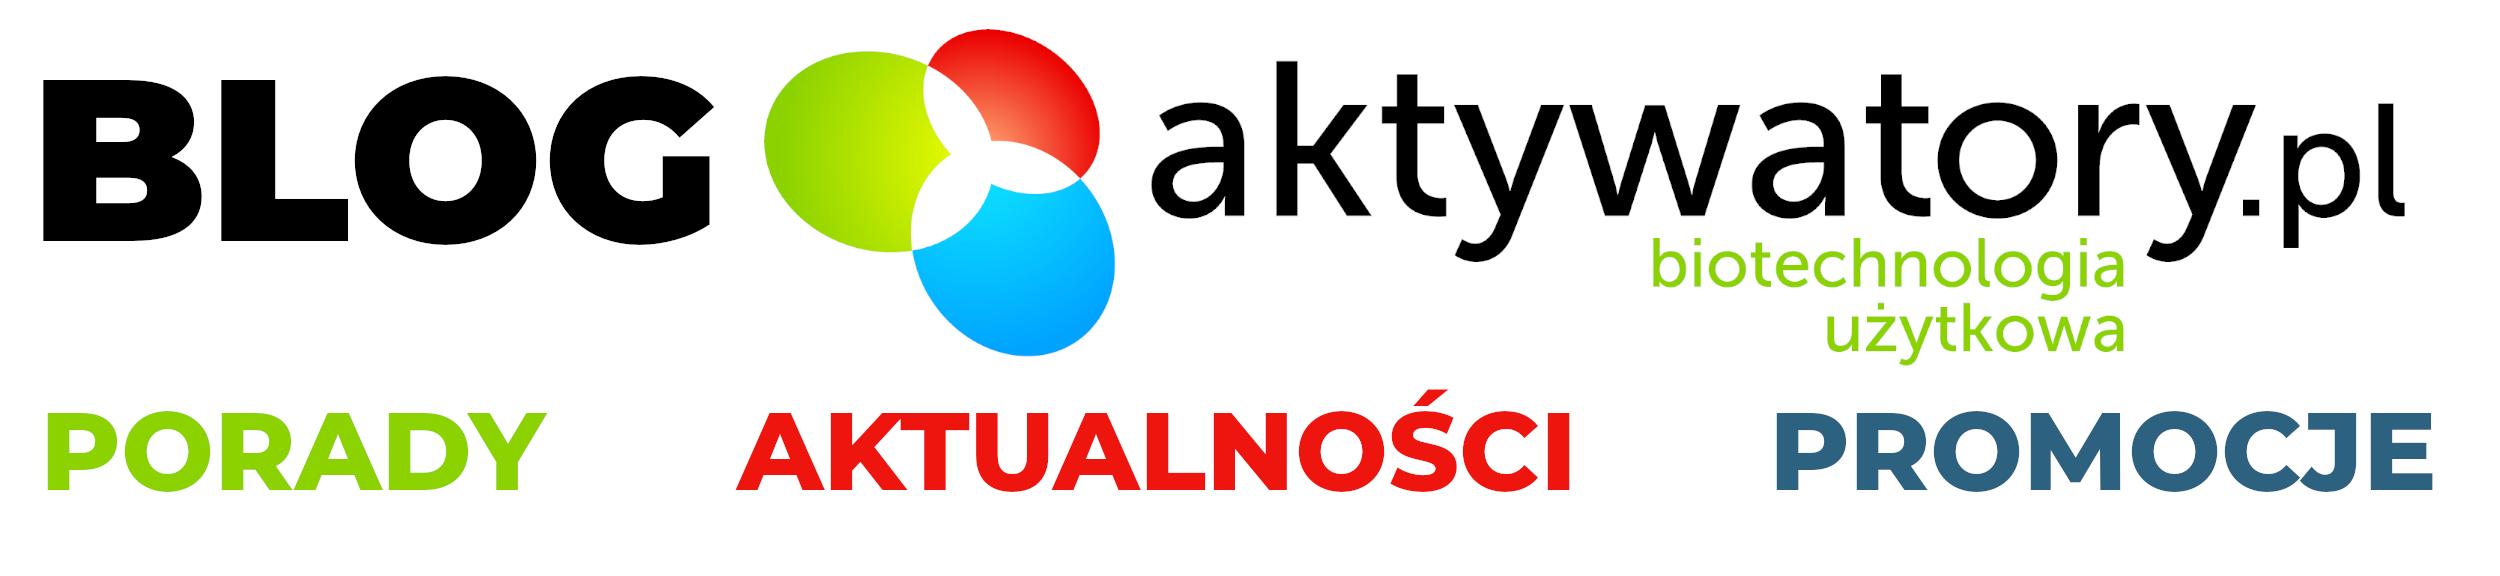 Aktywatory.pl Blog Aktualności